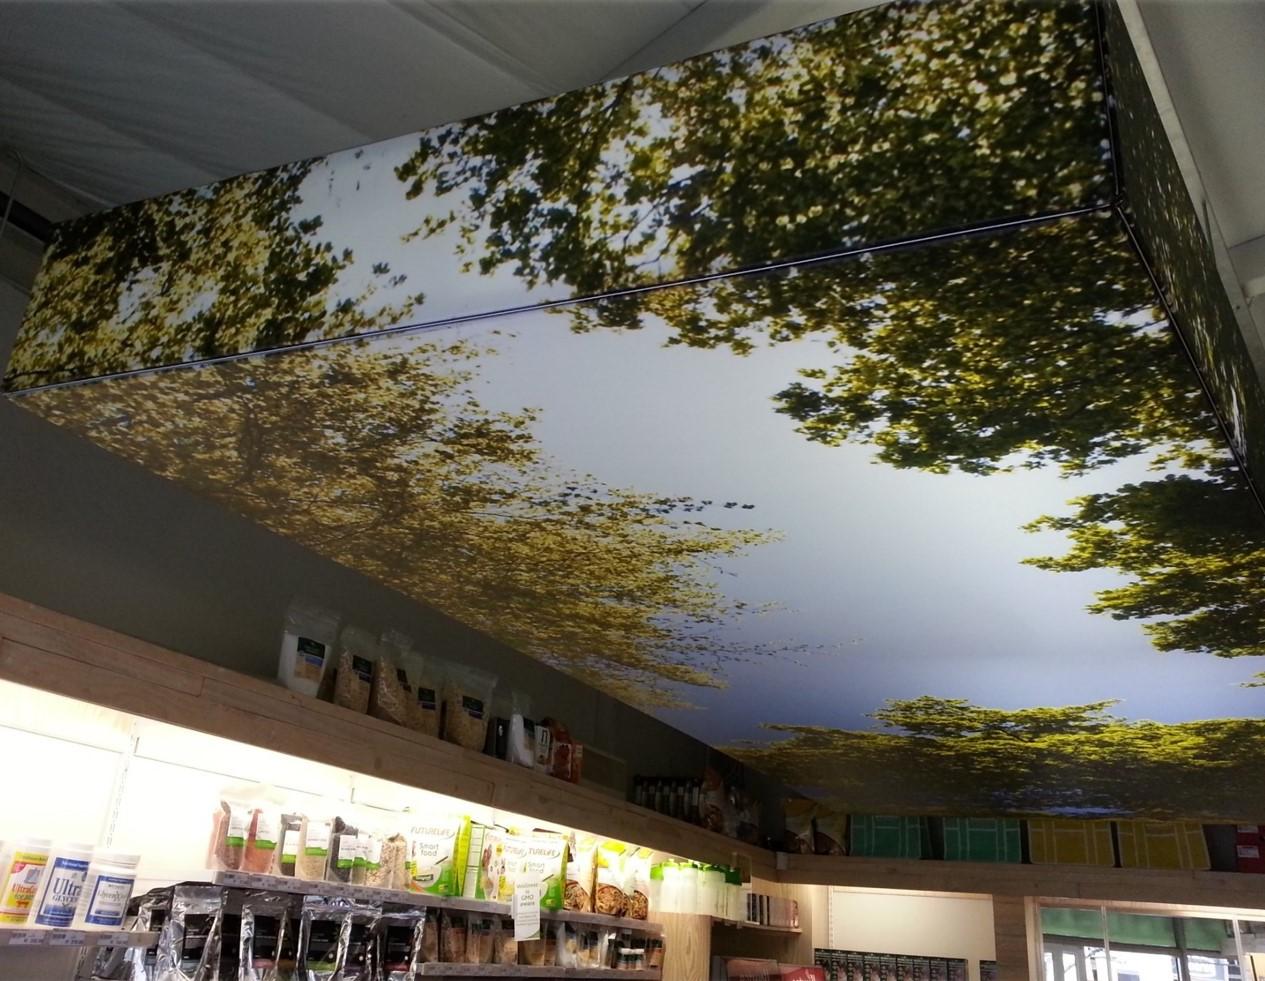 Flash ceiling bulkhead